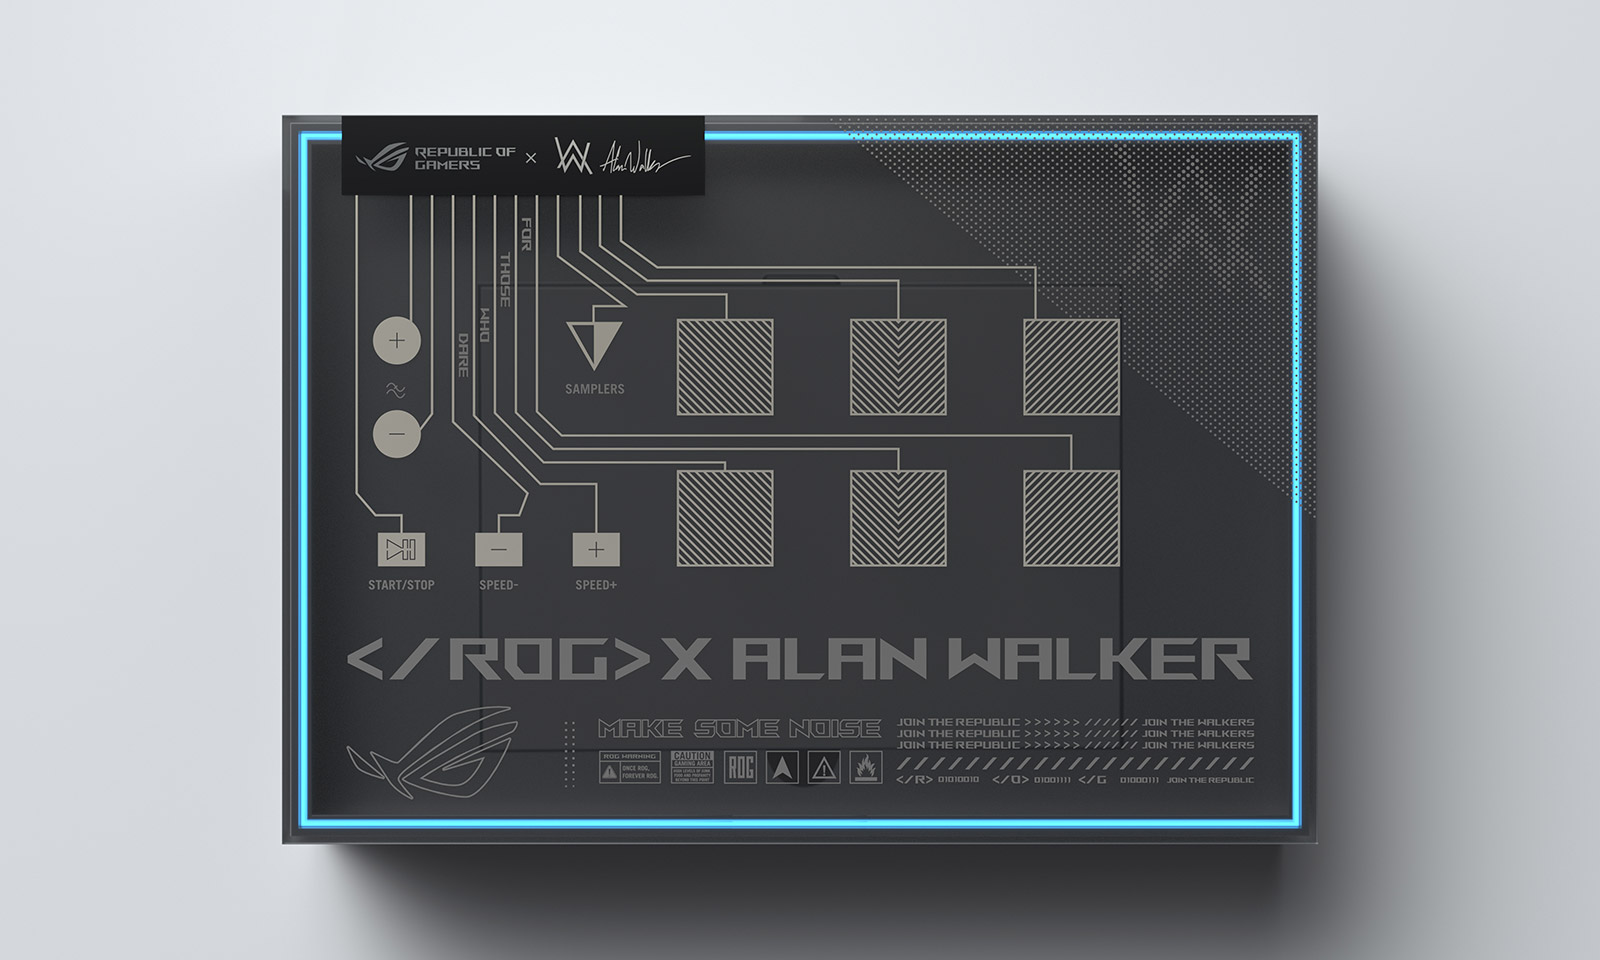 Cutia ROG Remix a laptopului Zephyrus G14 Alan Walker Special Edition